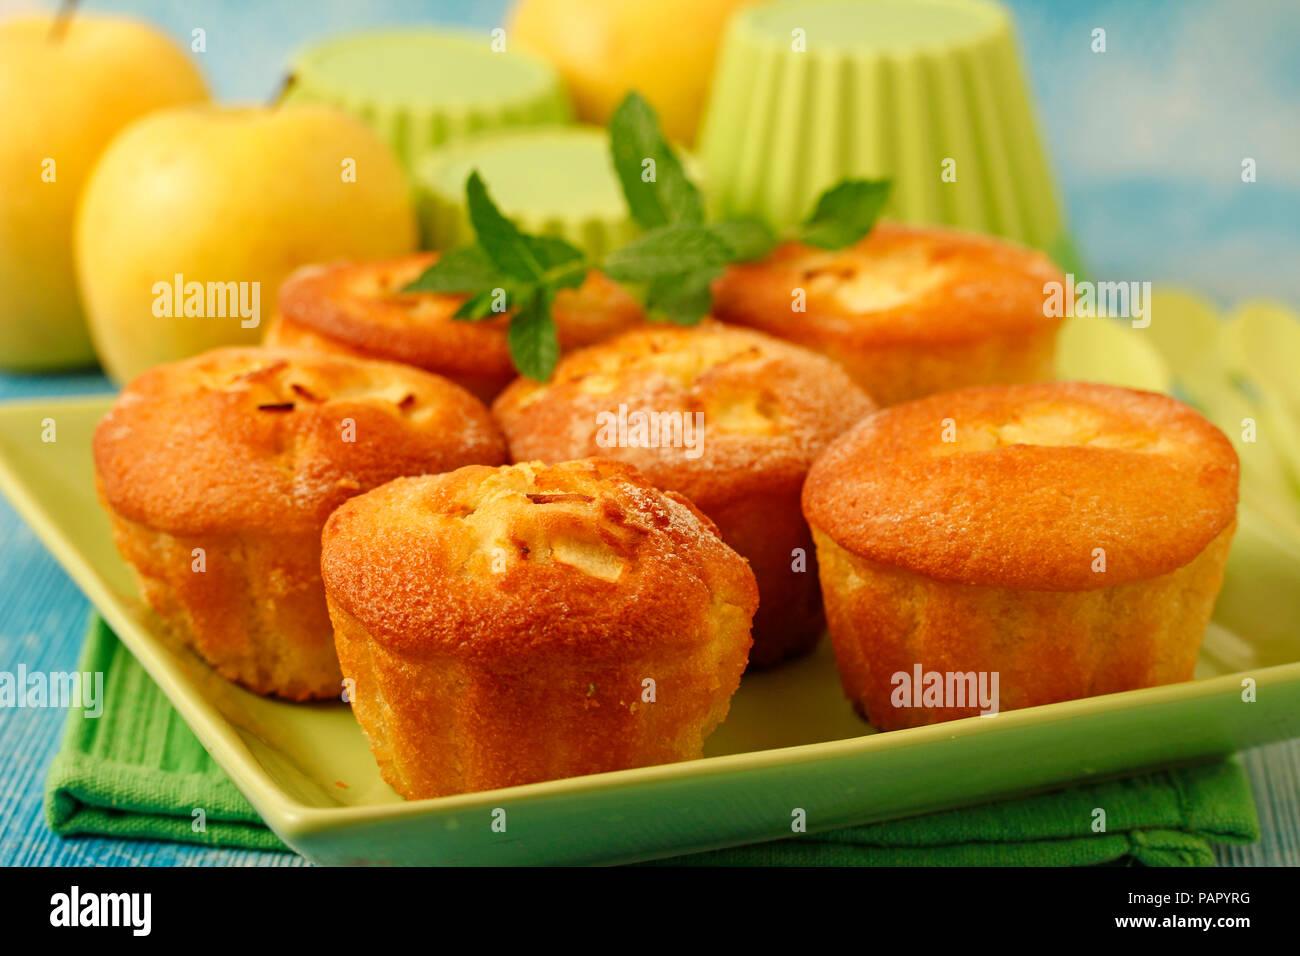 Apple muffins. - Stock Image